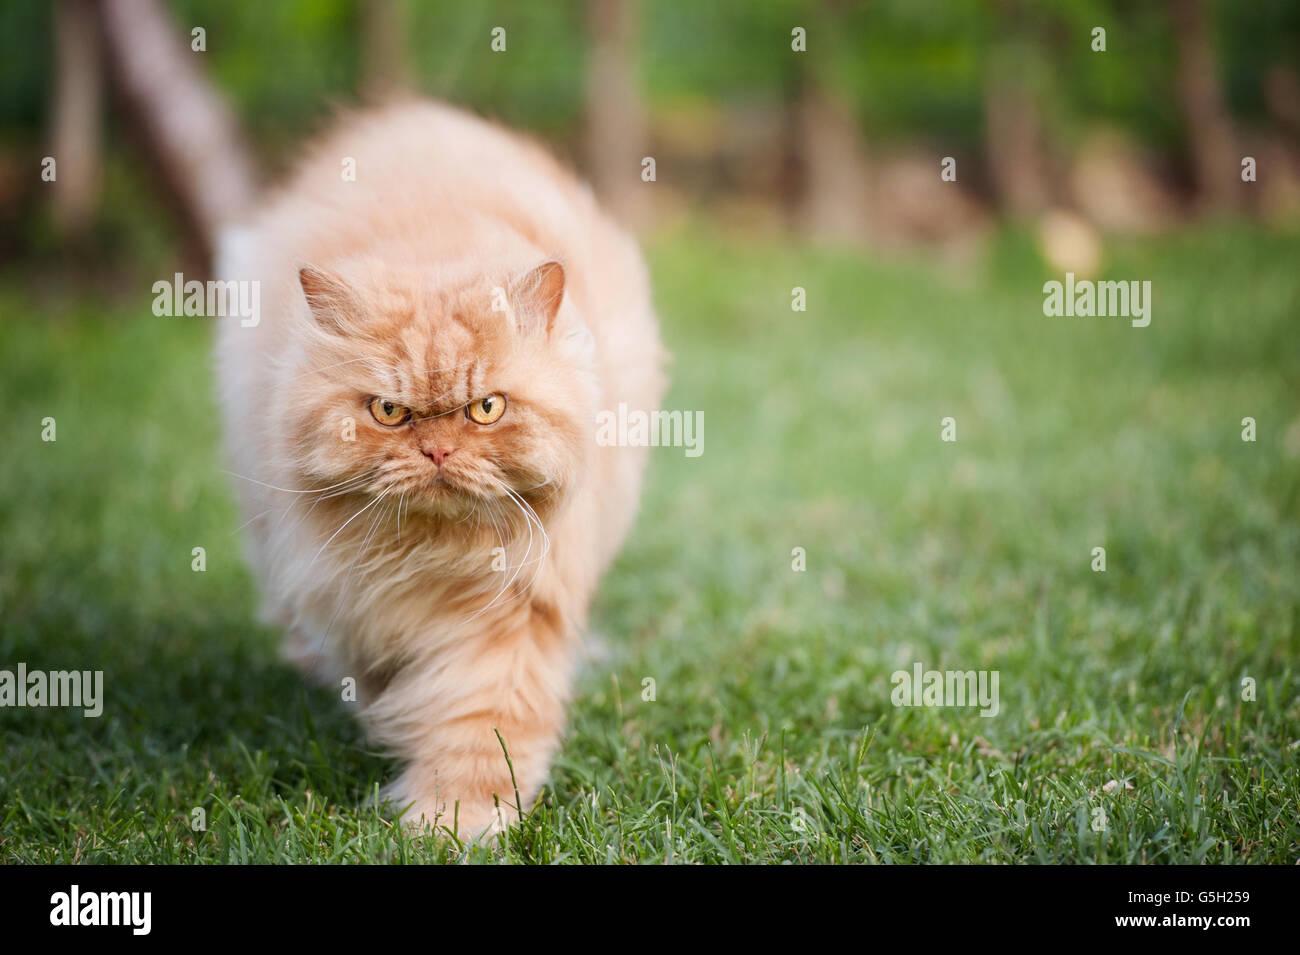 Gato persa enojado caminando Foto de stock